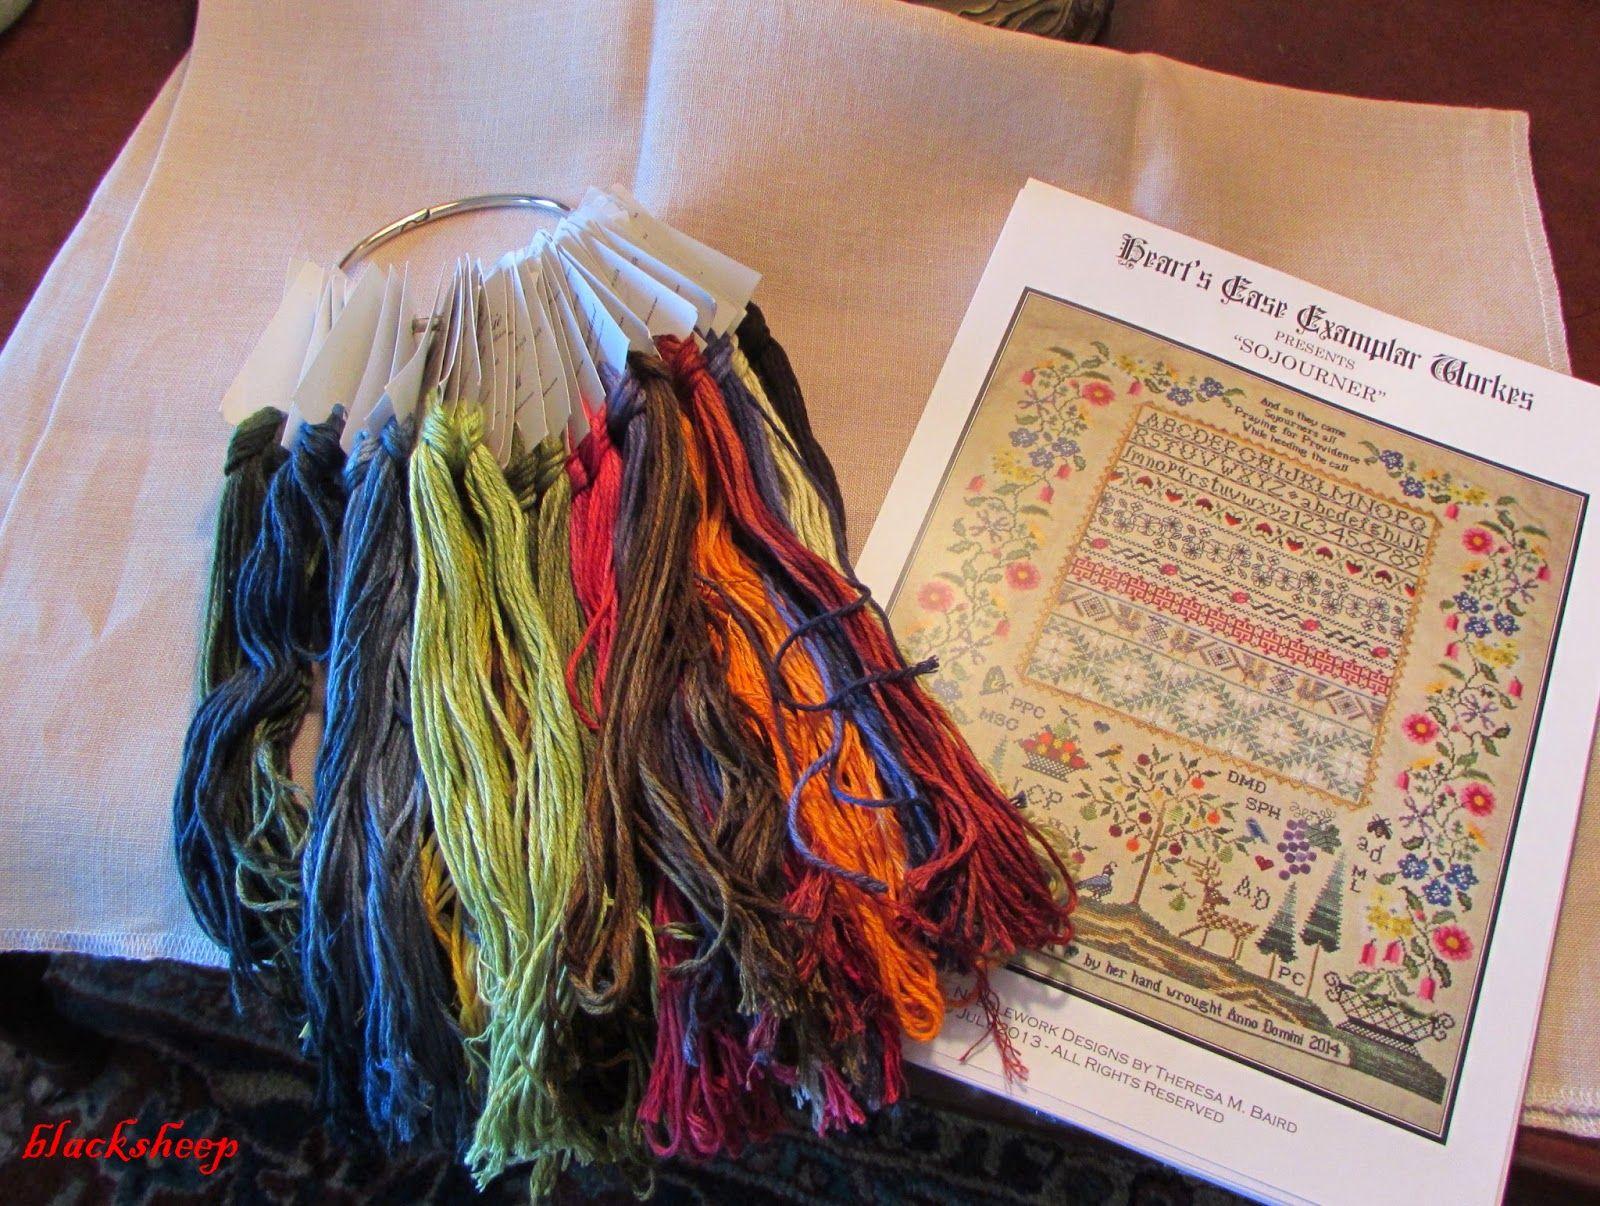 Blacksheep's bit of the Web: Some Stitchin' Stuff - Something Old, Some Shopping and Something New